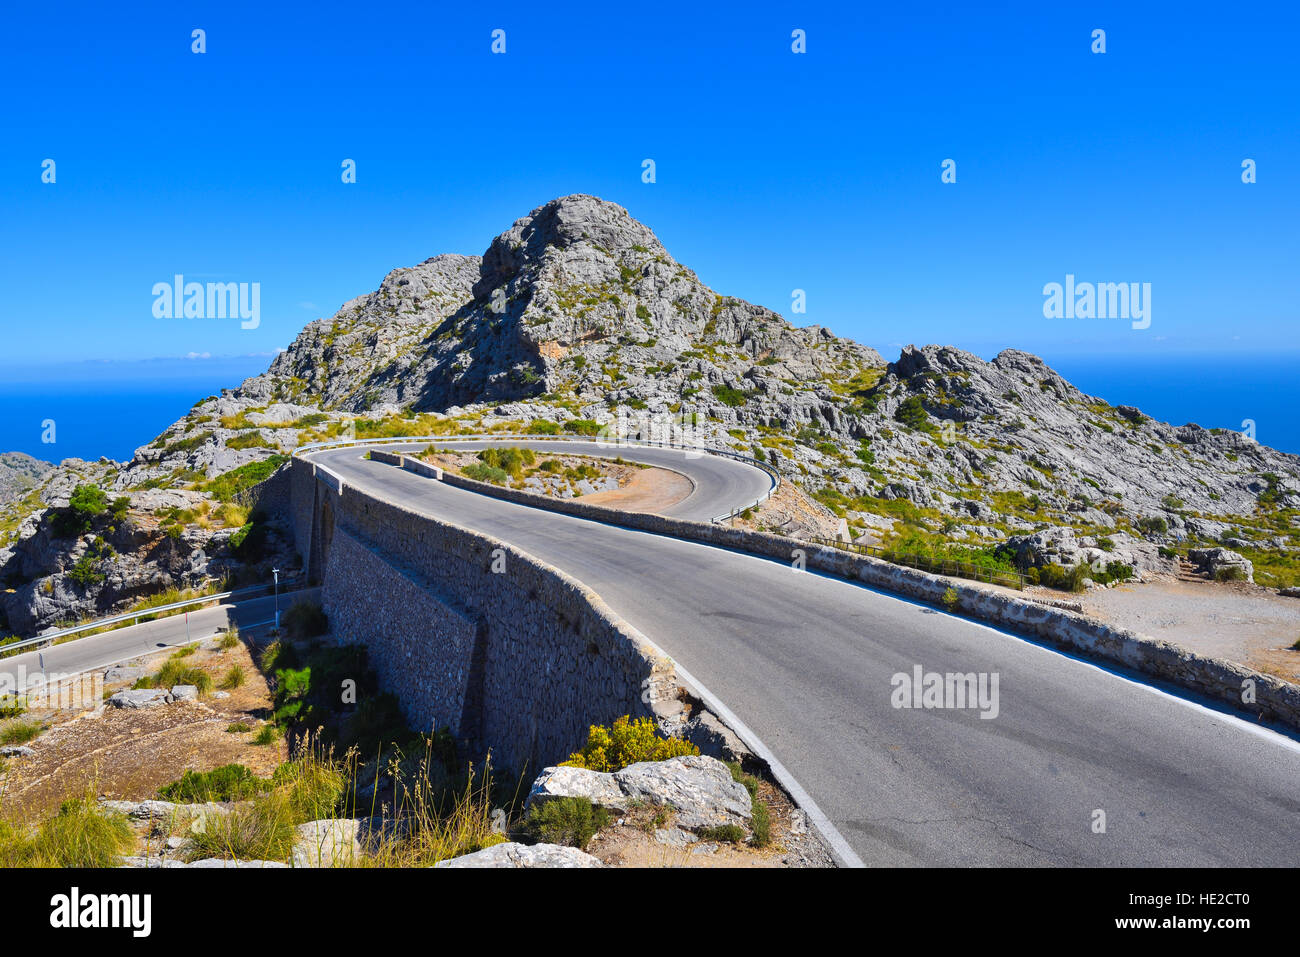 The Spiral bridge on the mountain road to Sa Calobra on Majorca in Spain - Stock Image